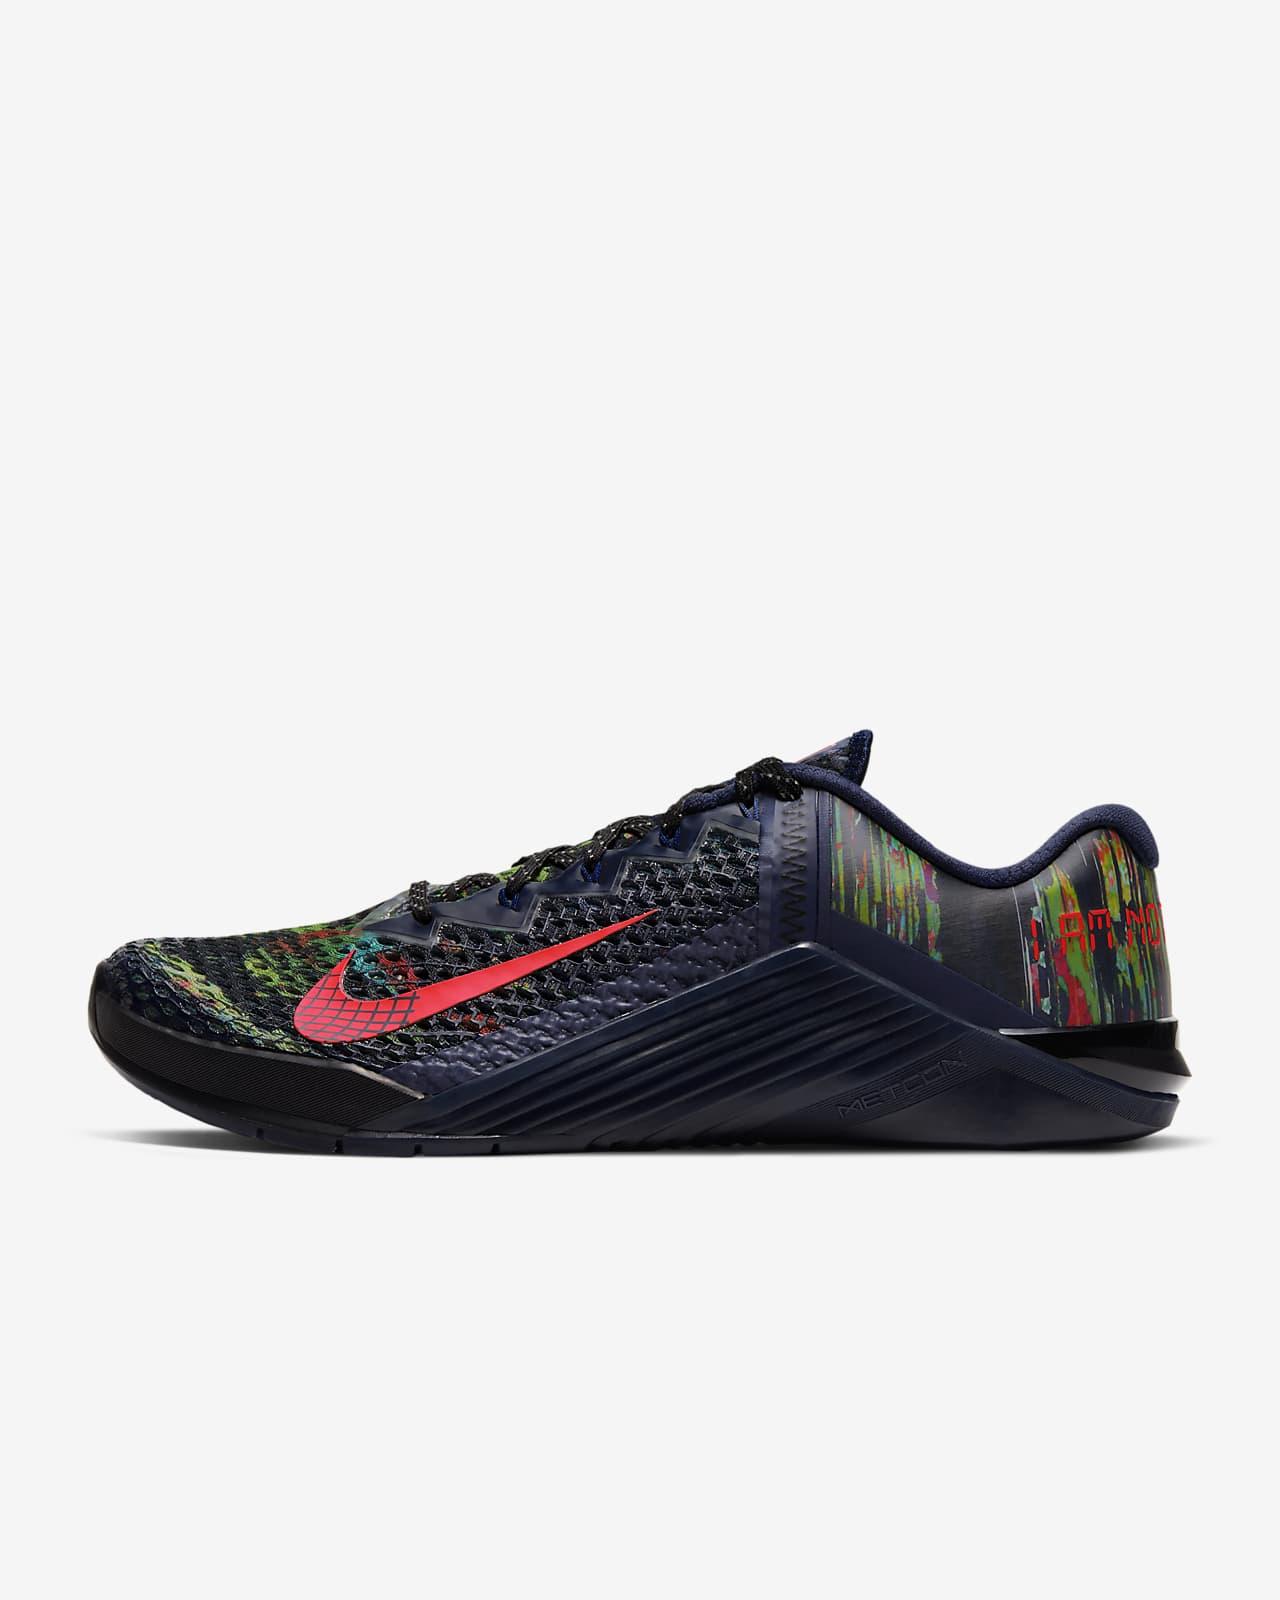 Chaussure de training Nike Metcon 6 AMP pour Homme